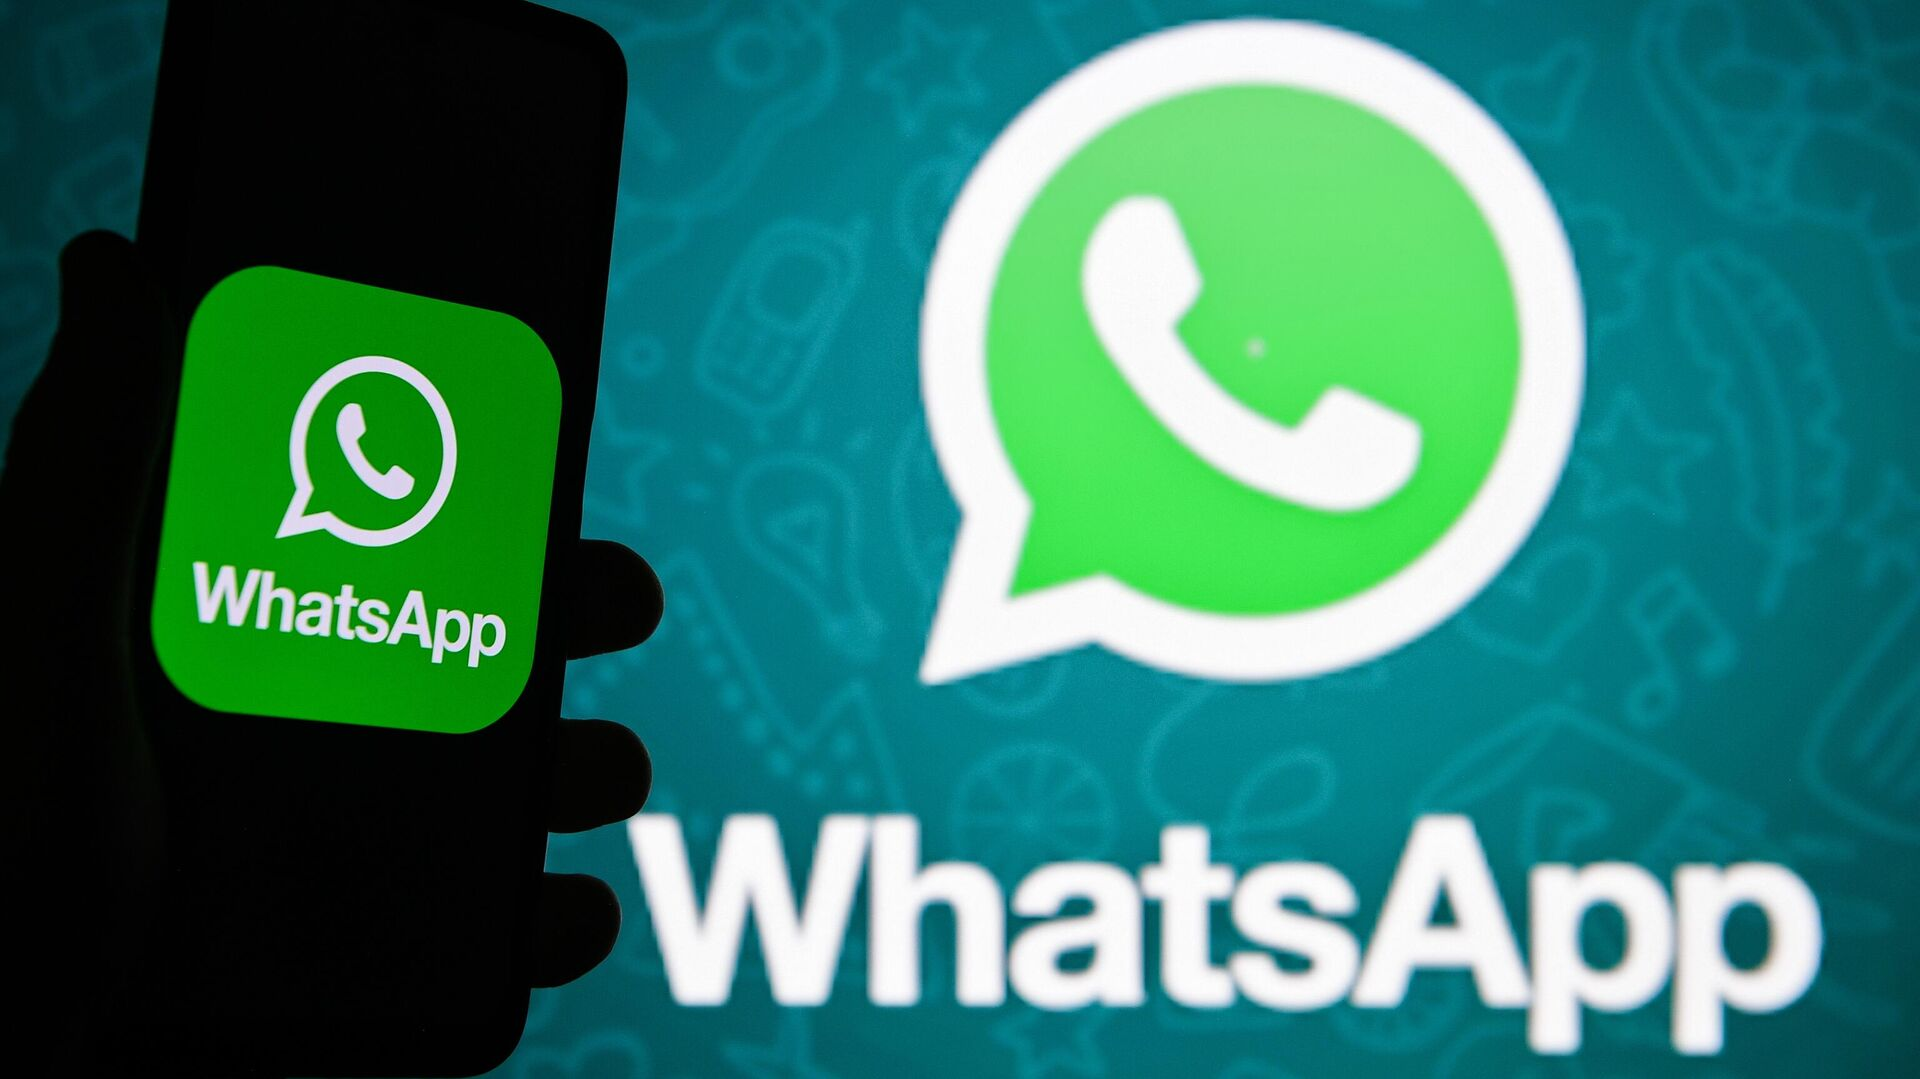 Логотип мессенджера WhatsApp - РИА Новости, 1920, 03.03.2021